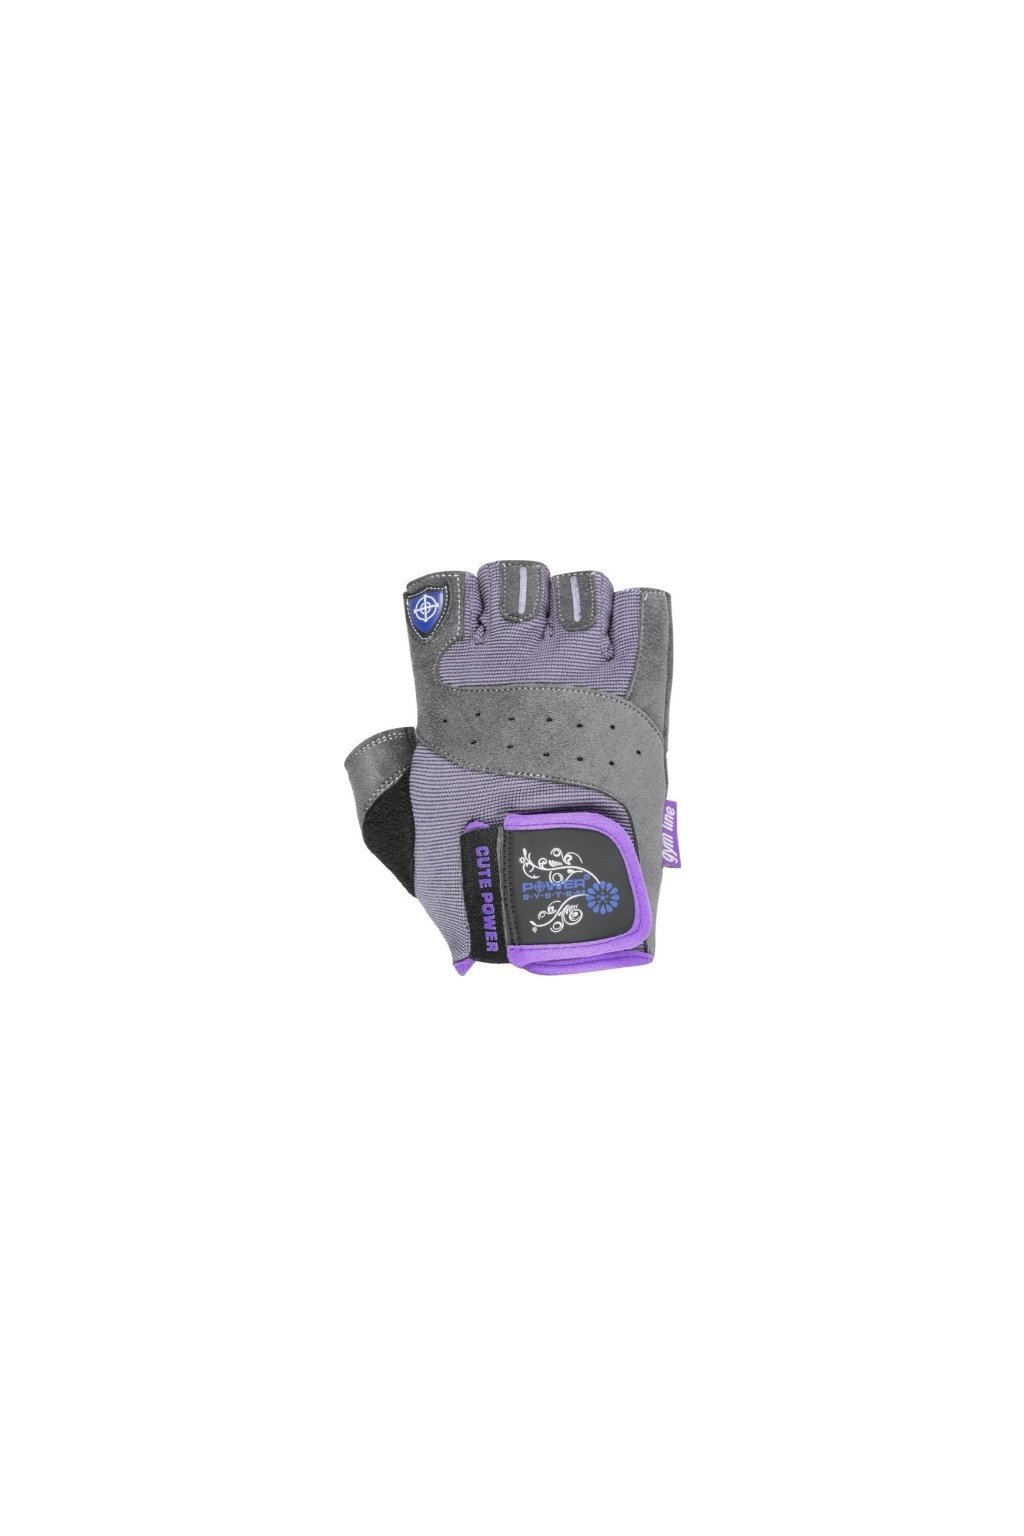 329652 power system fitness rukavice cute power fialova farba